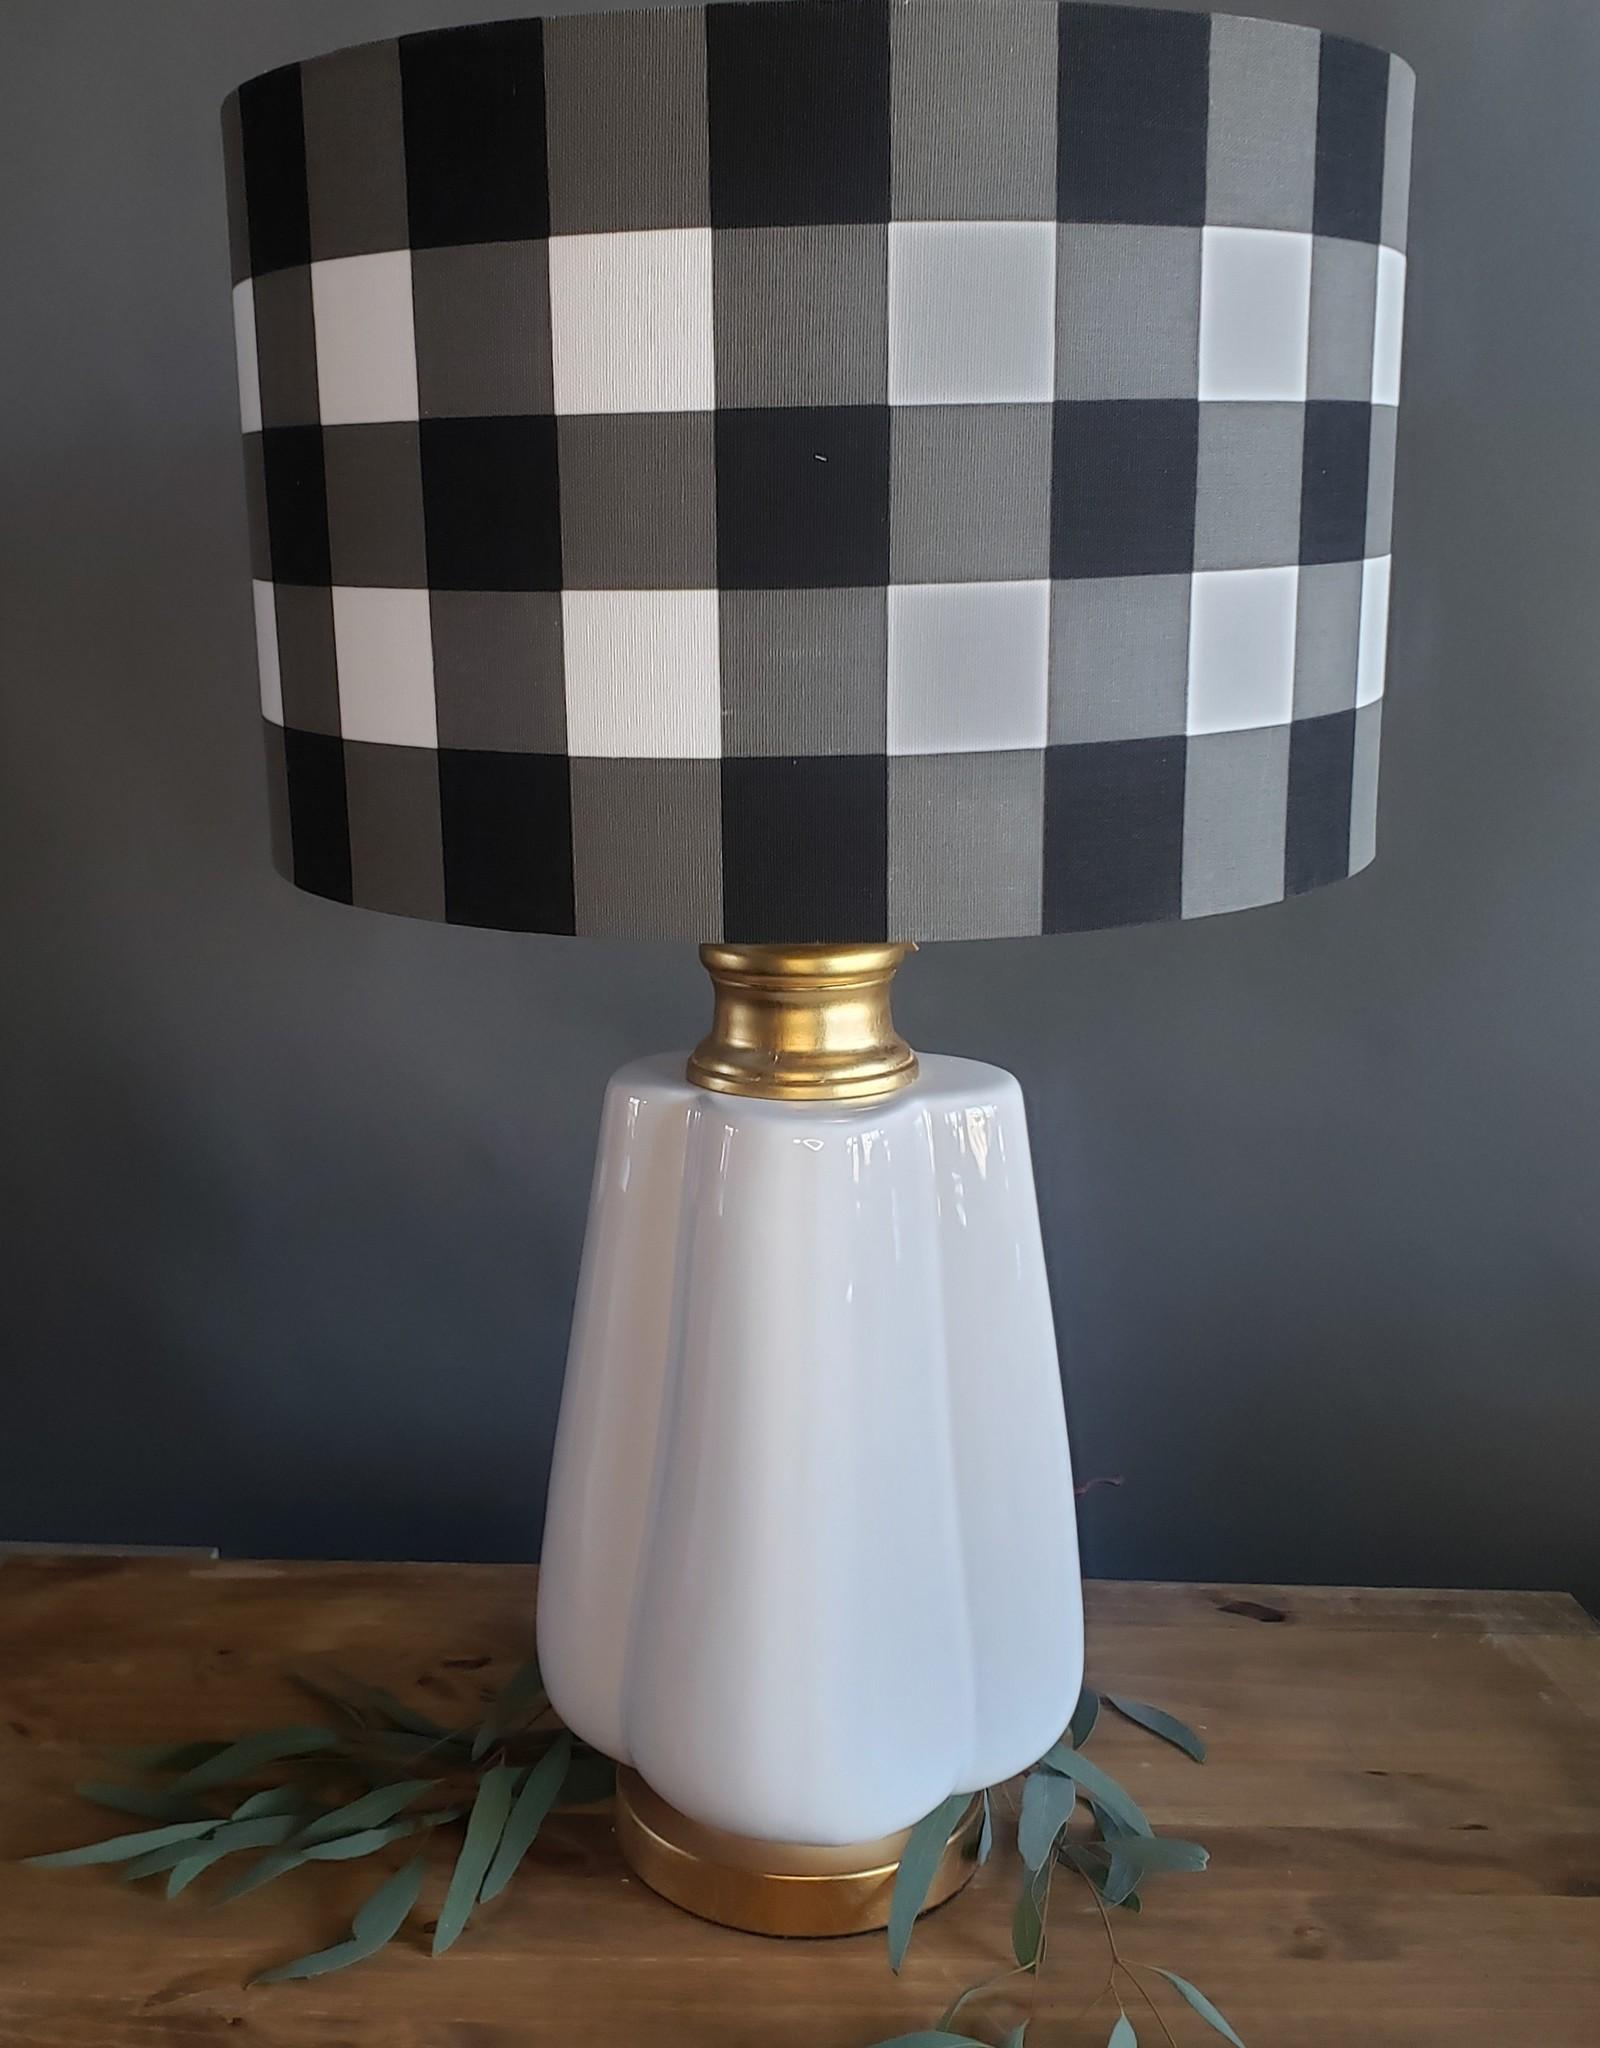 Home on the Range Lamp